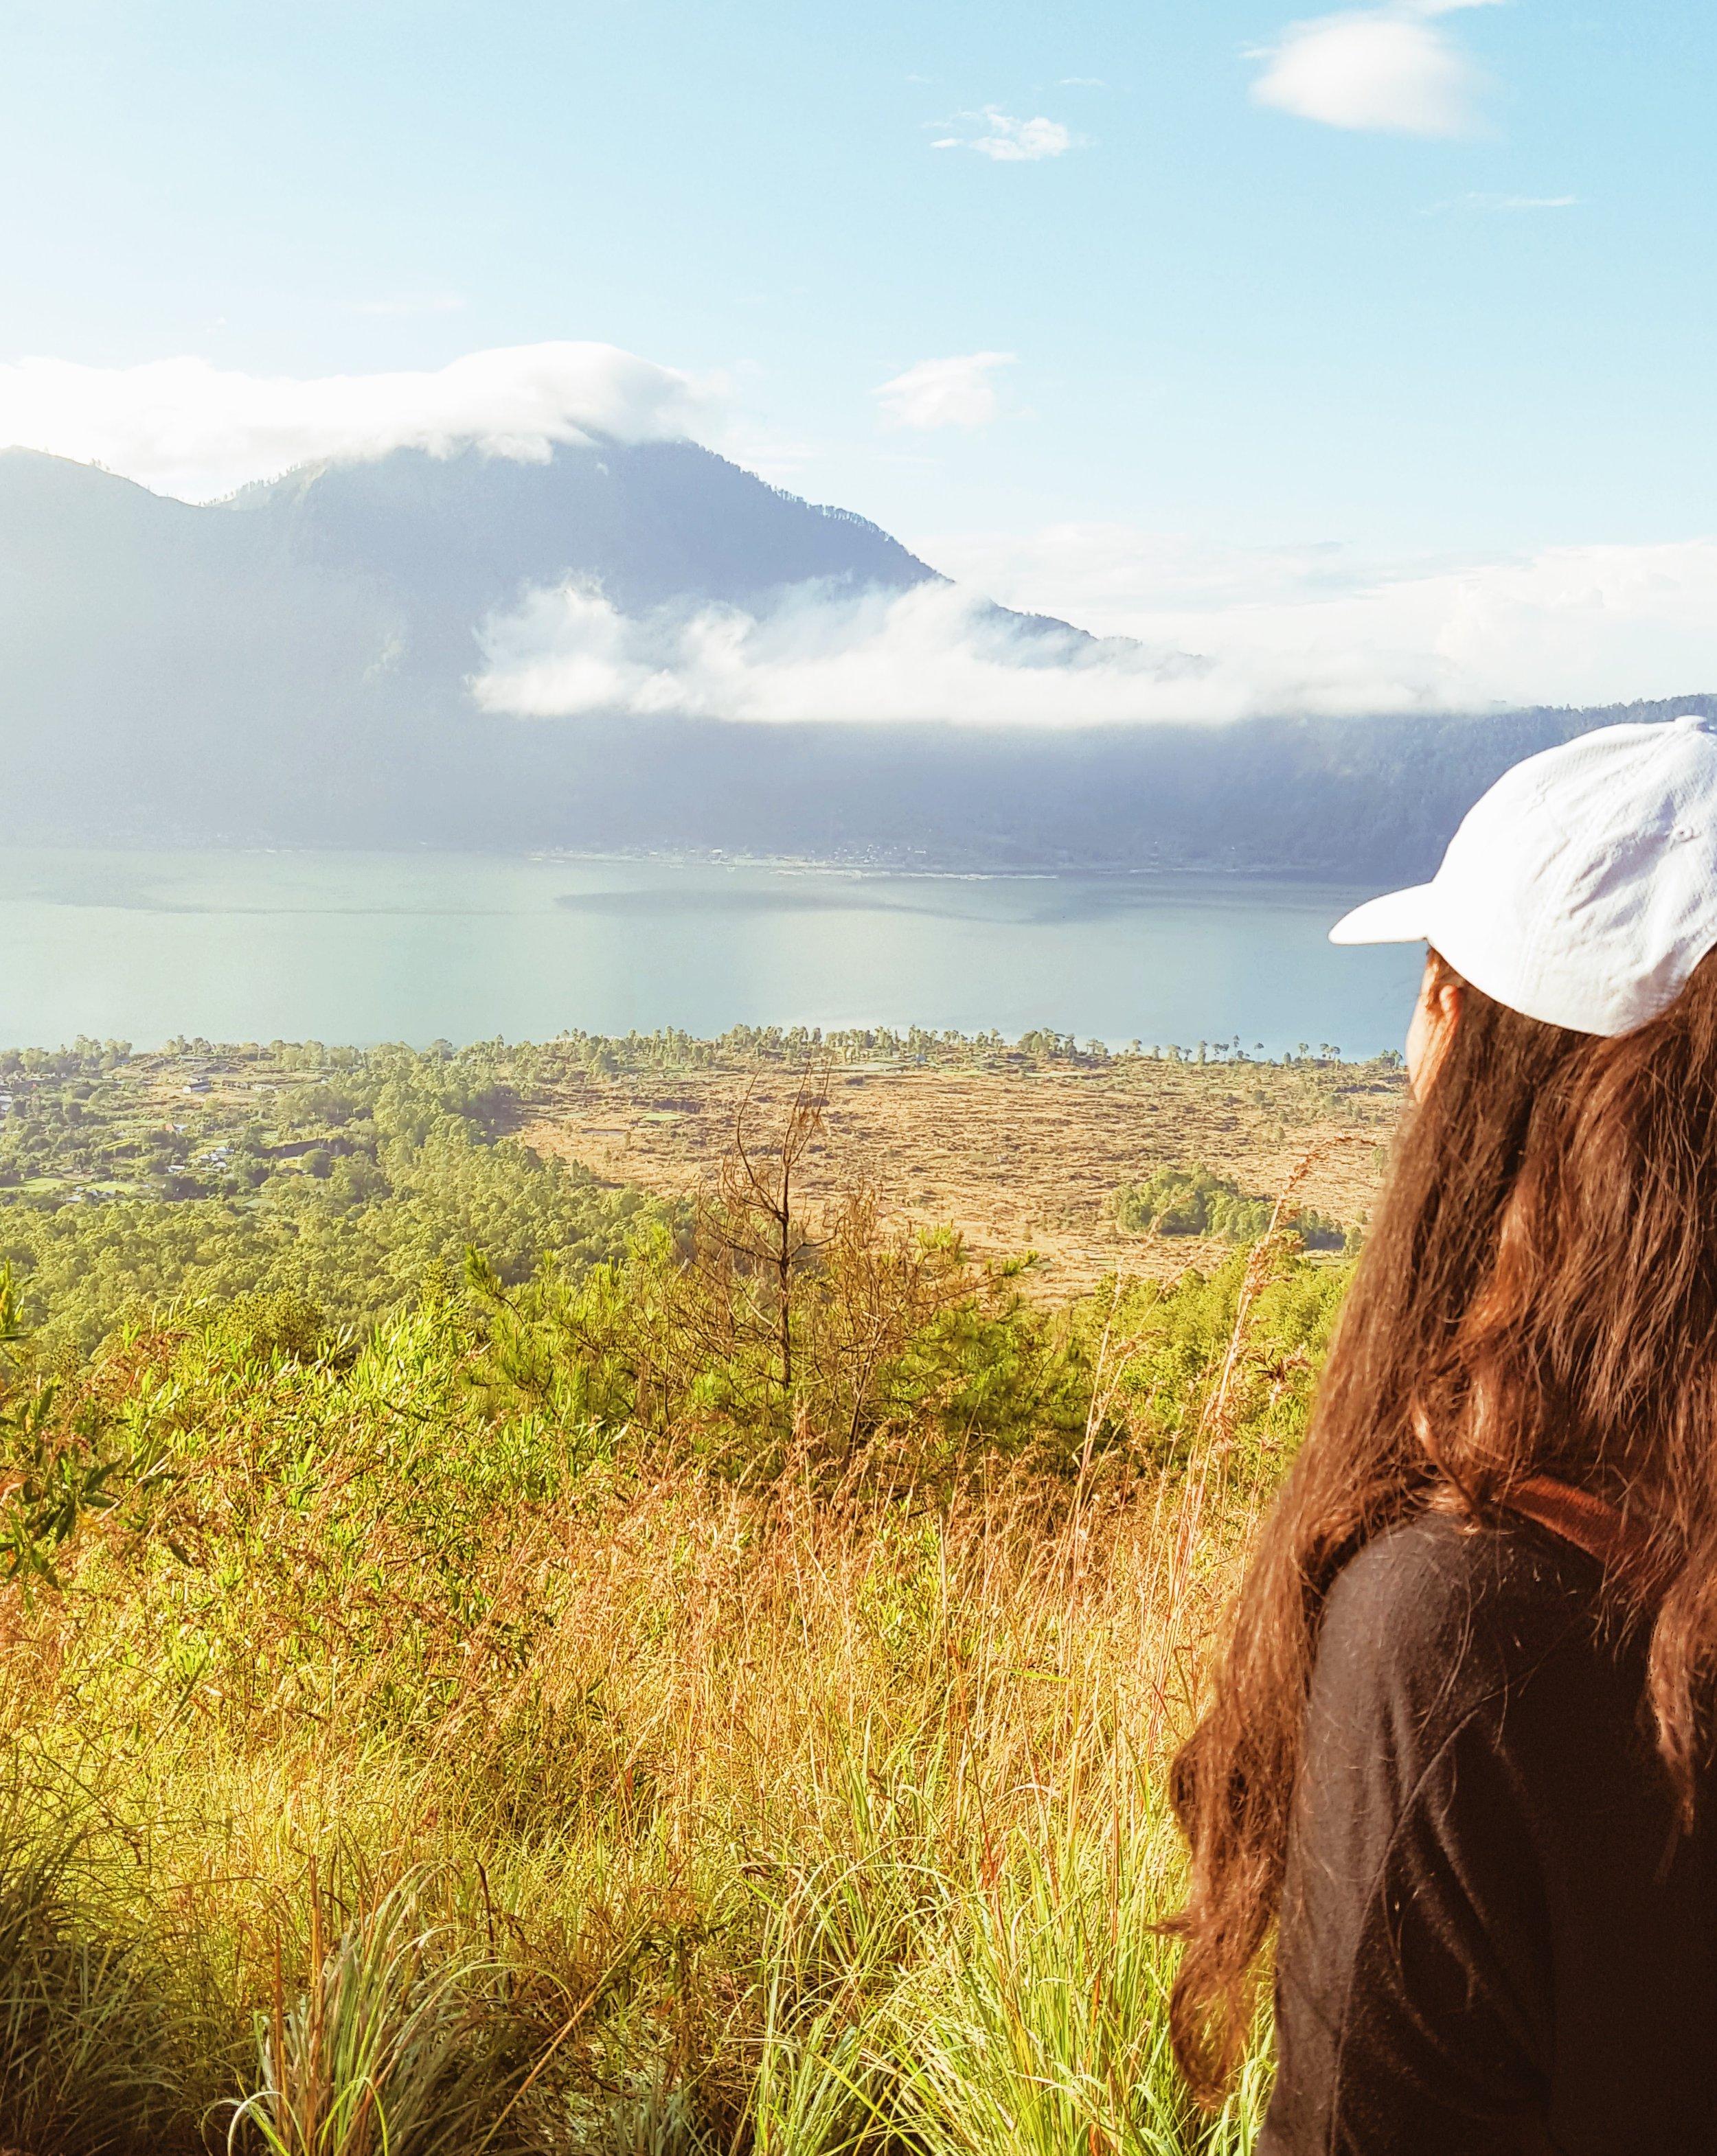 Mel在Kintamani Lake,Batur Sunrise Mike,Bali,Lillumelatiobeplay3体育官方下载n.com